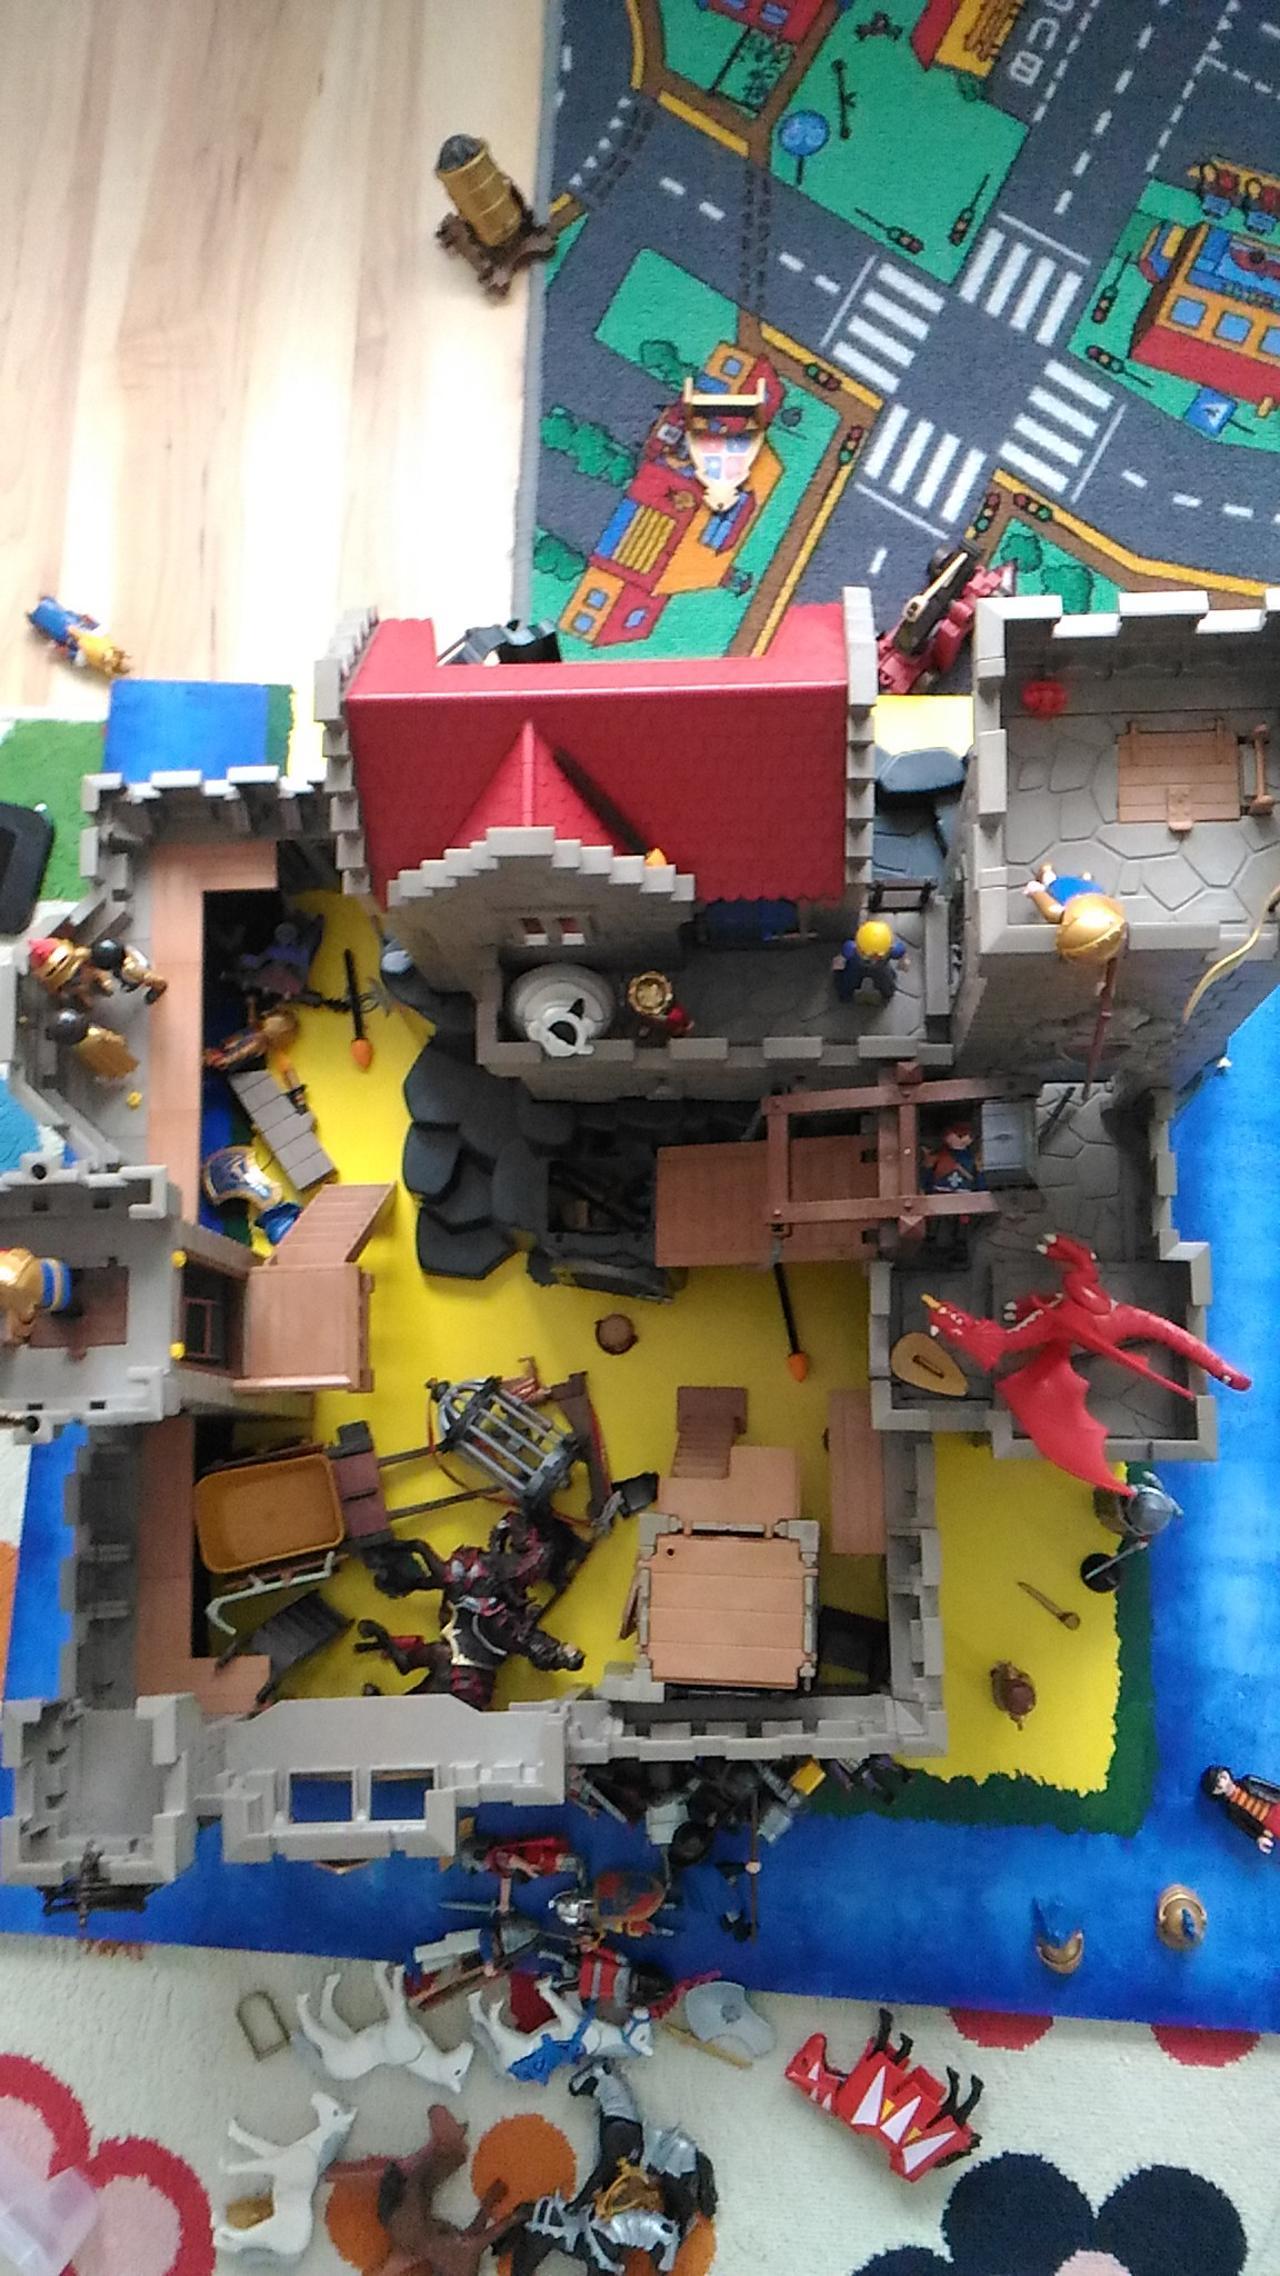 Wohin Mit Dem Playmobil Haus Forum Kindergartenalter Urbia De